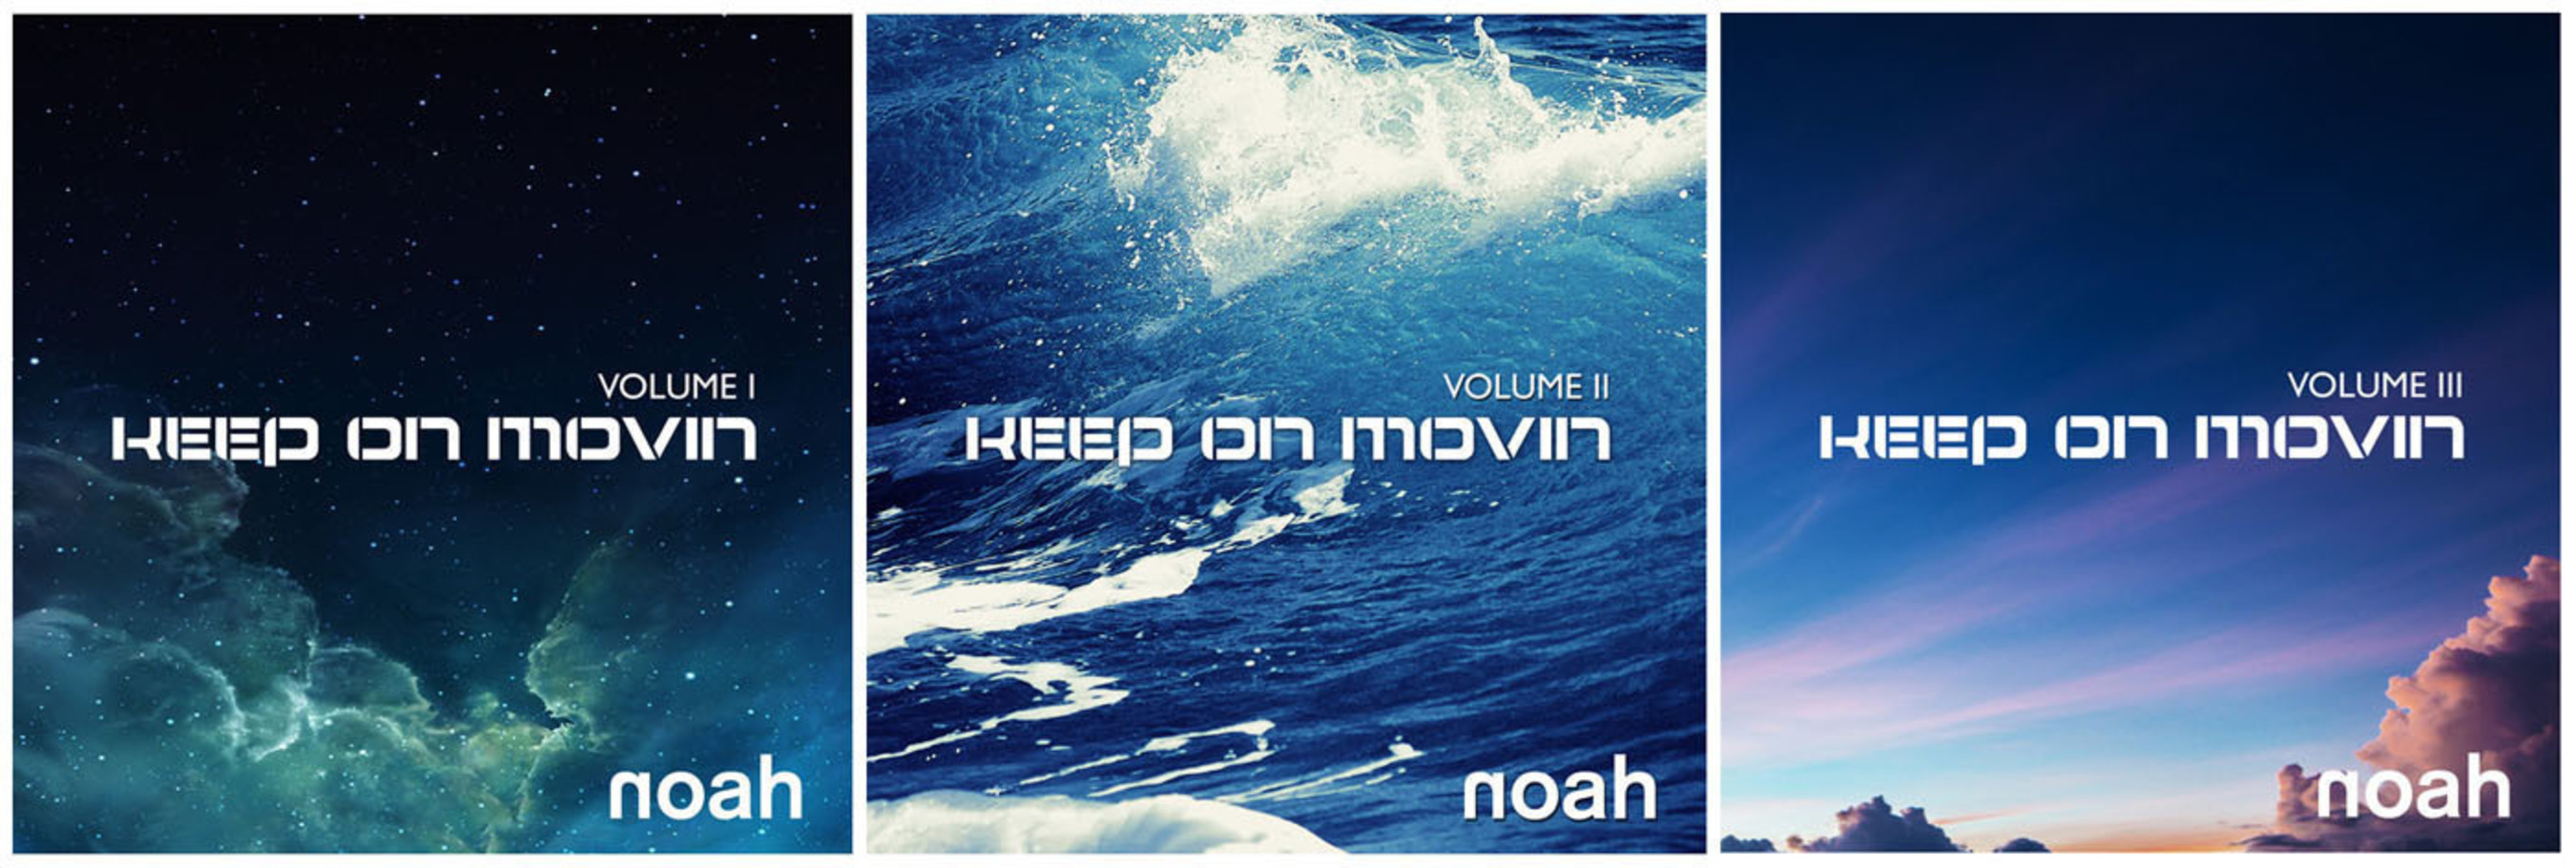 NOAH's Keep On Movin' Vol I - Vol III.  (PRNewsFoto/NOAH)